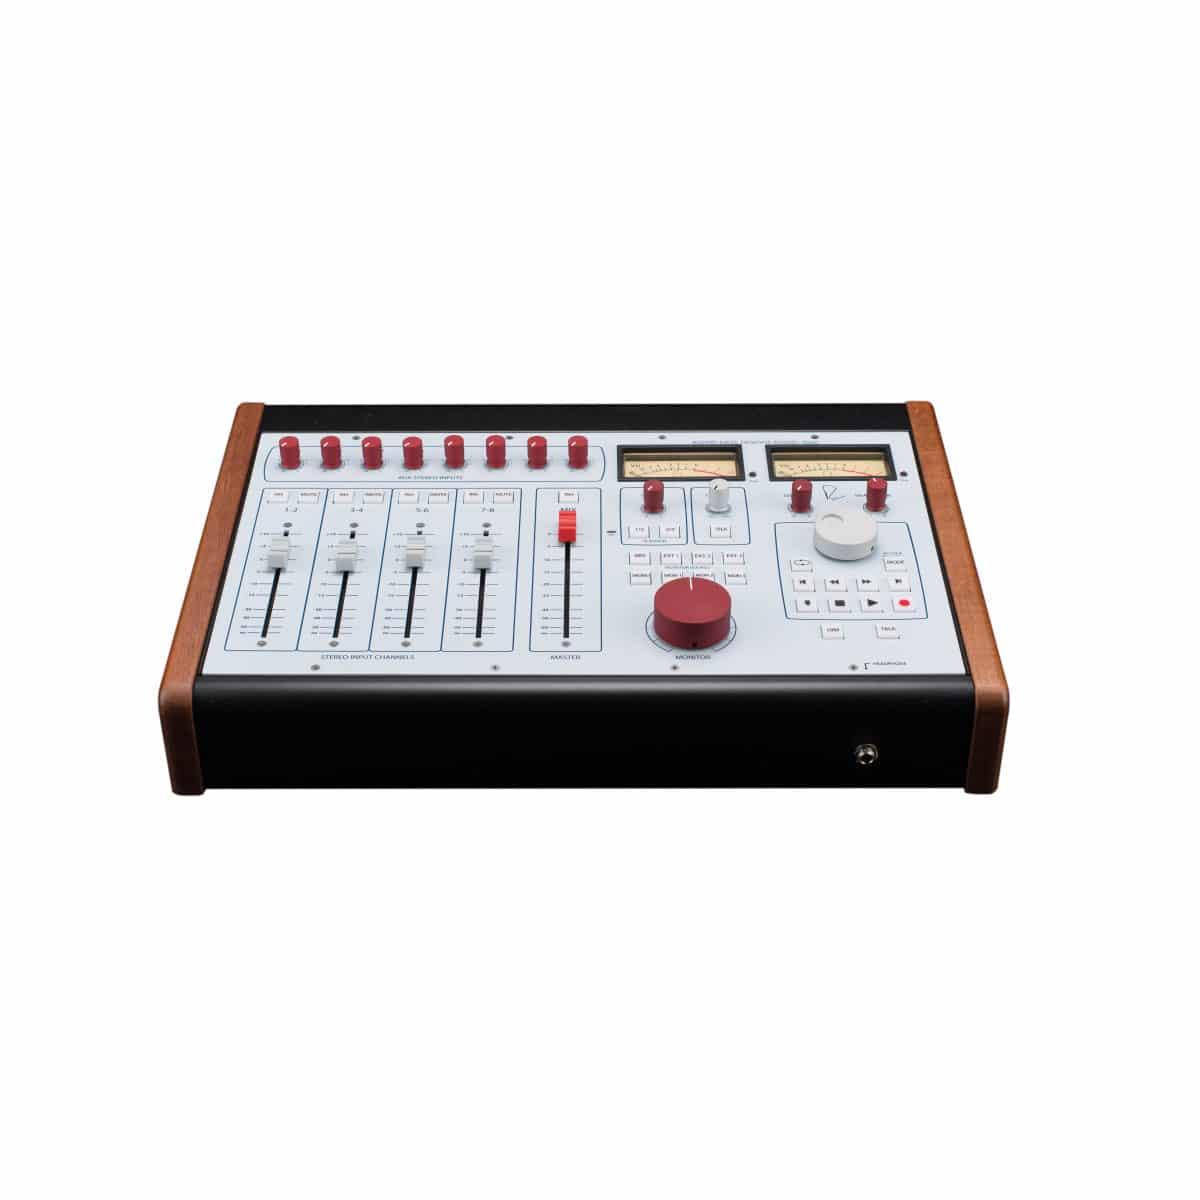 Rupert Neve 5060 Centerpiece 01 Pro Audio, Outboard, Sommatori e Mixer